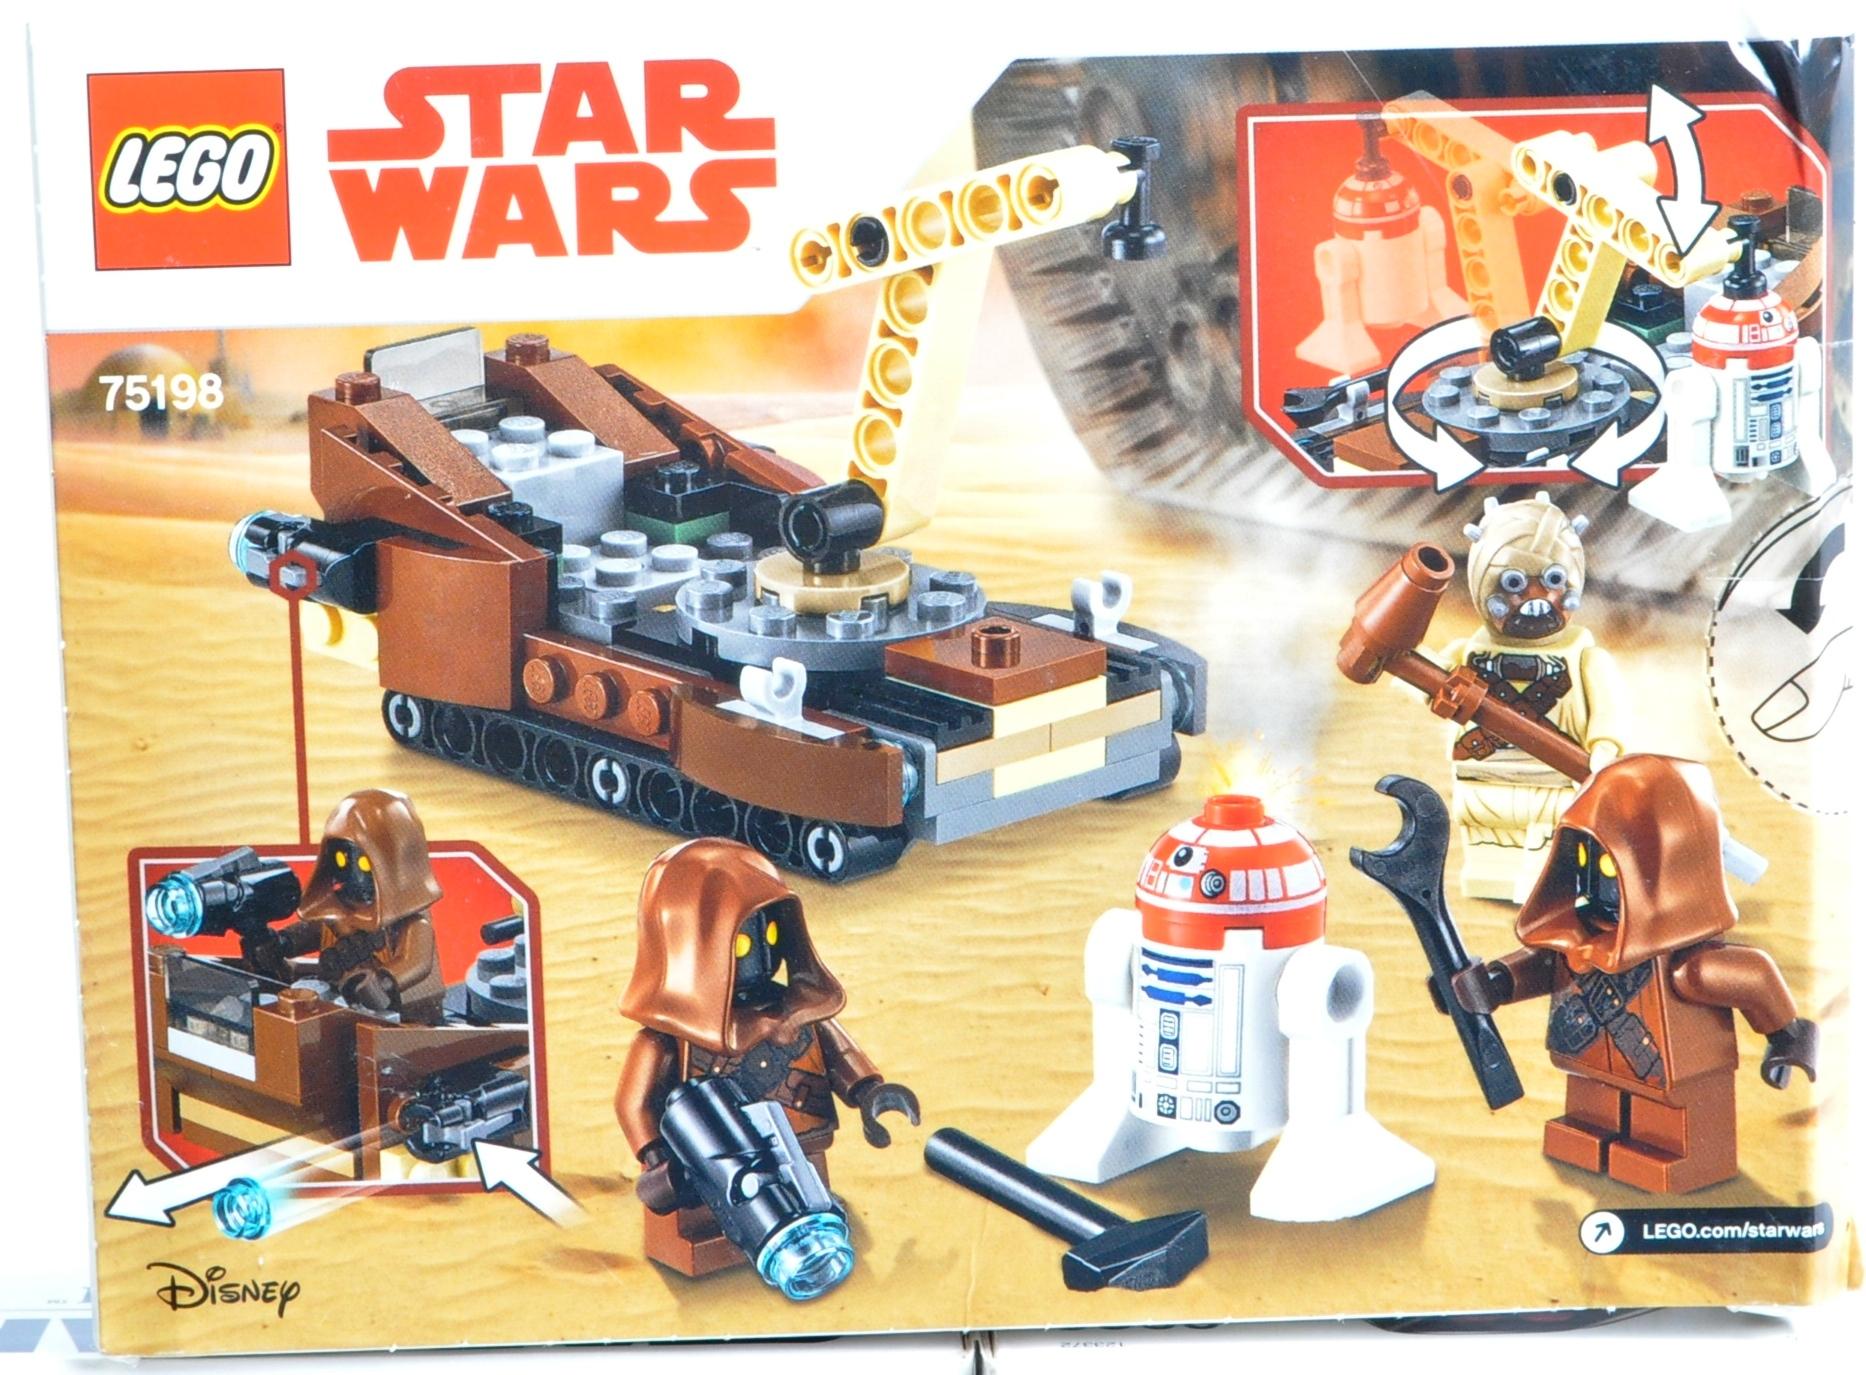 LEGO SETS - LEGO STAR WARS - 3866 / 75111 / 75114 / 75198 - Image 2 of 8